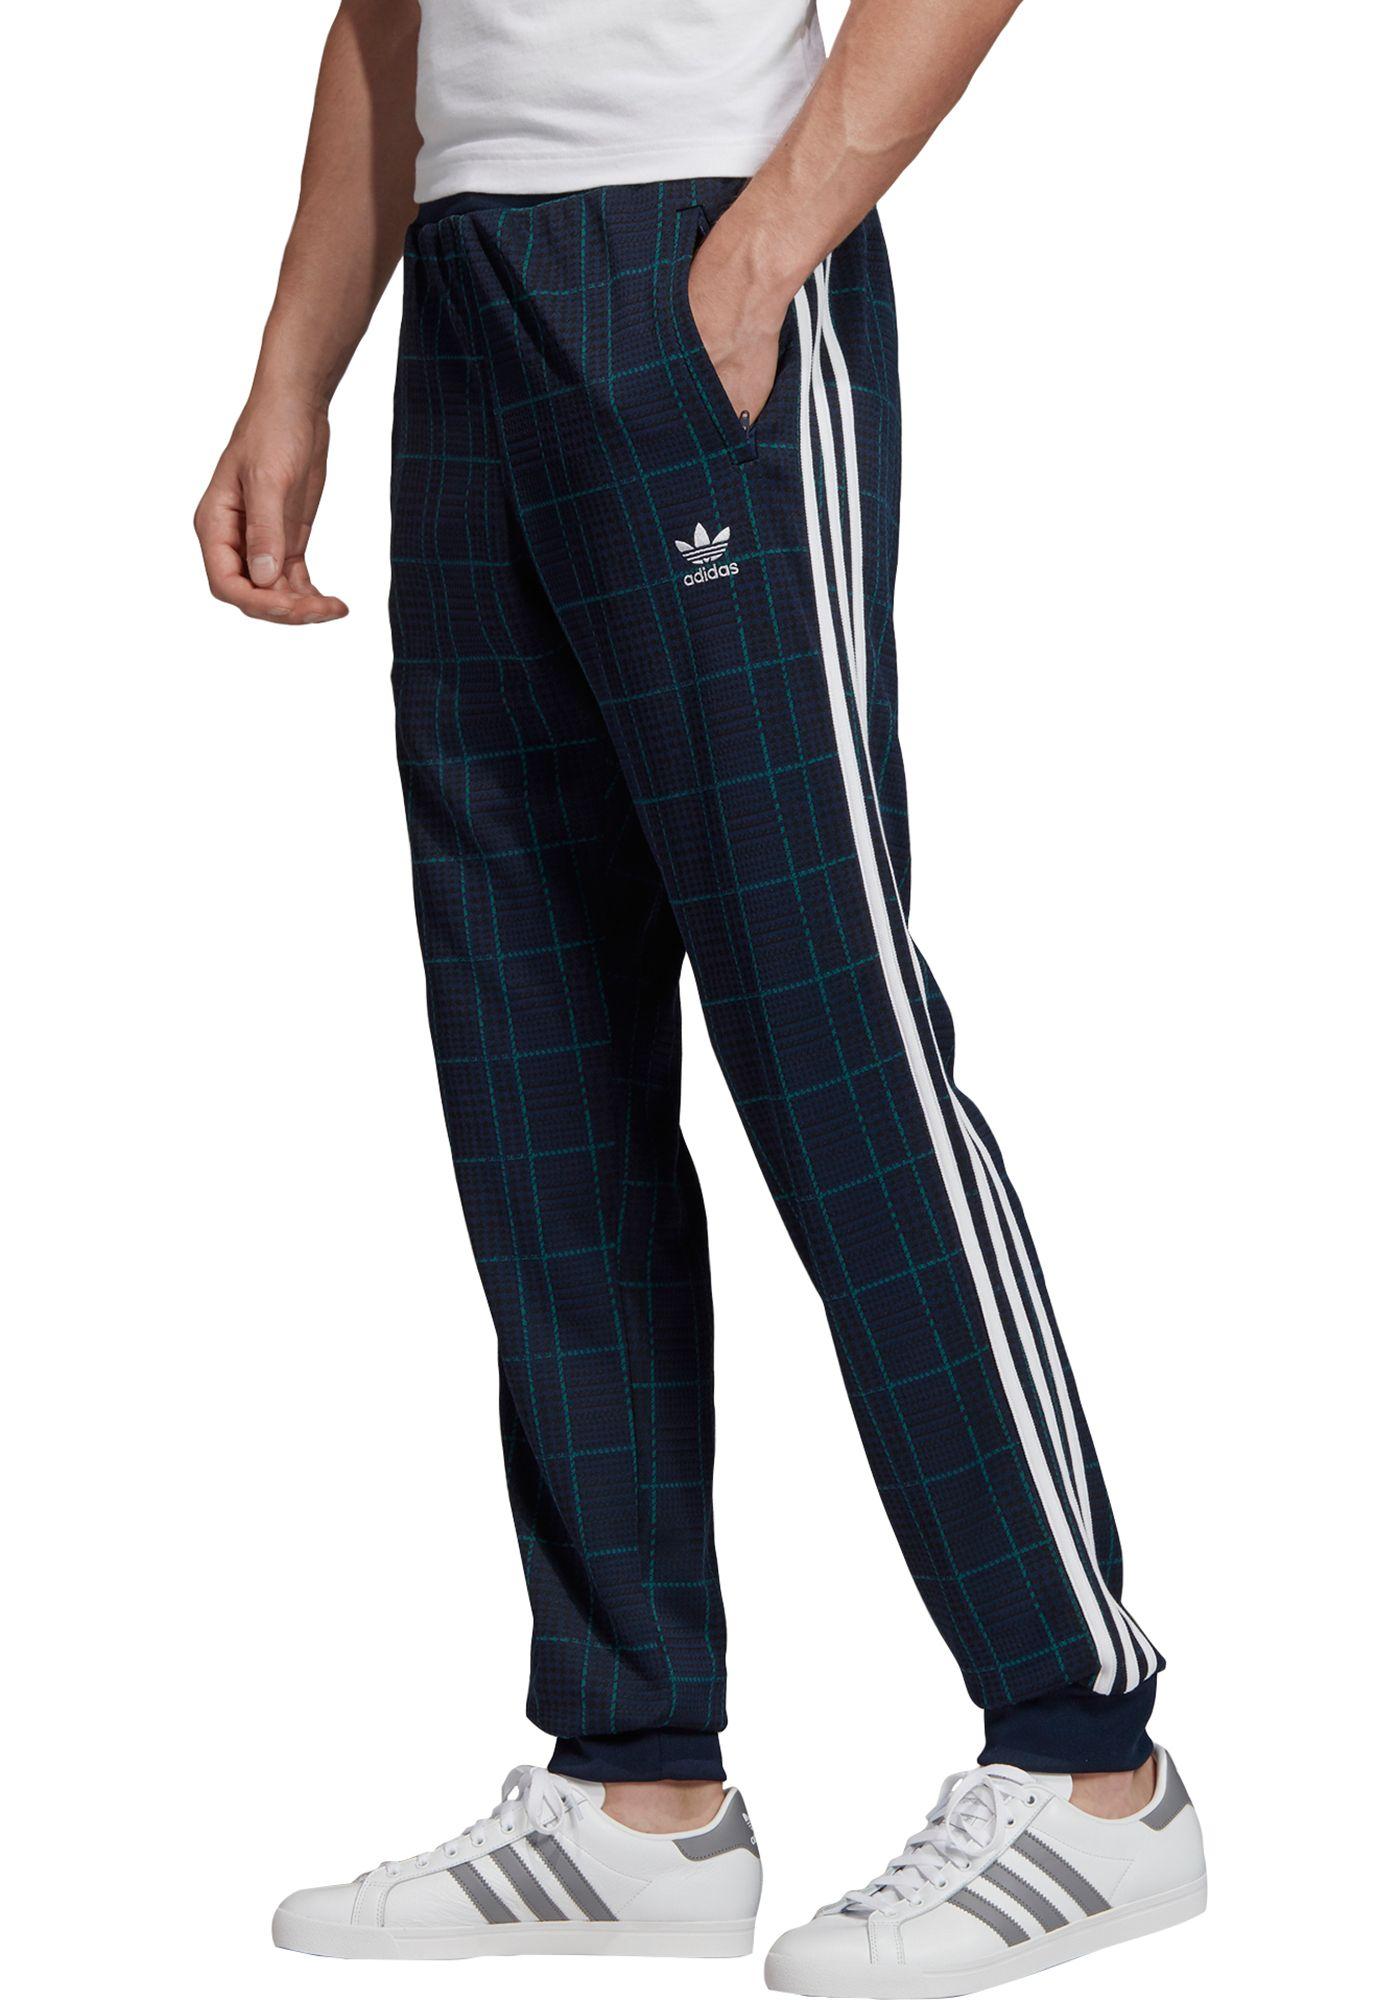 adidas Originals Men's Tartan Pants